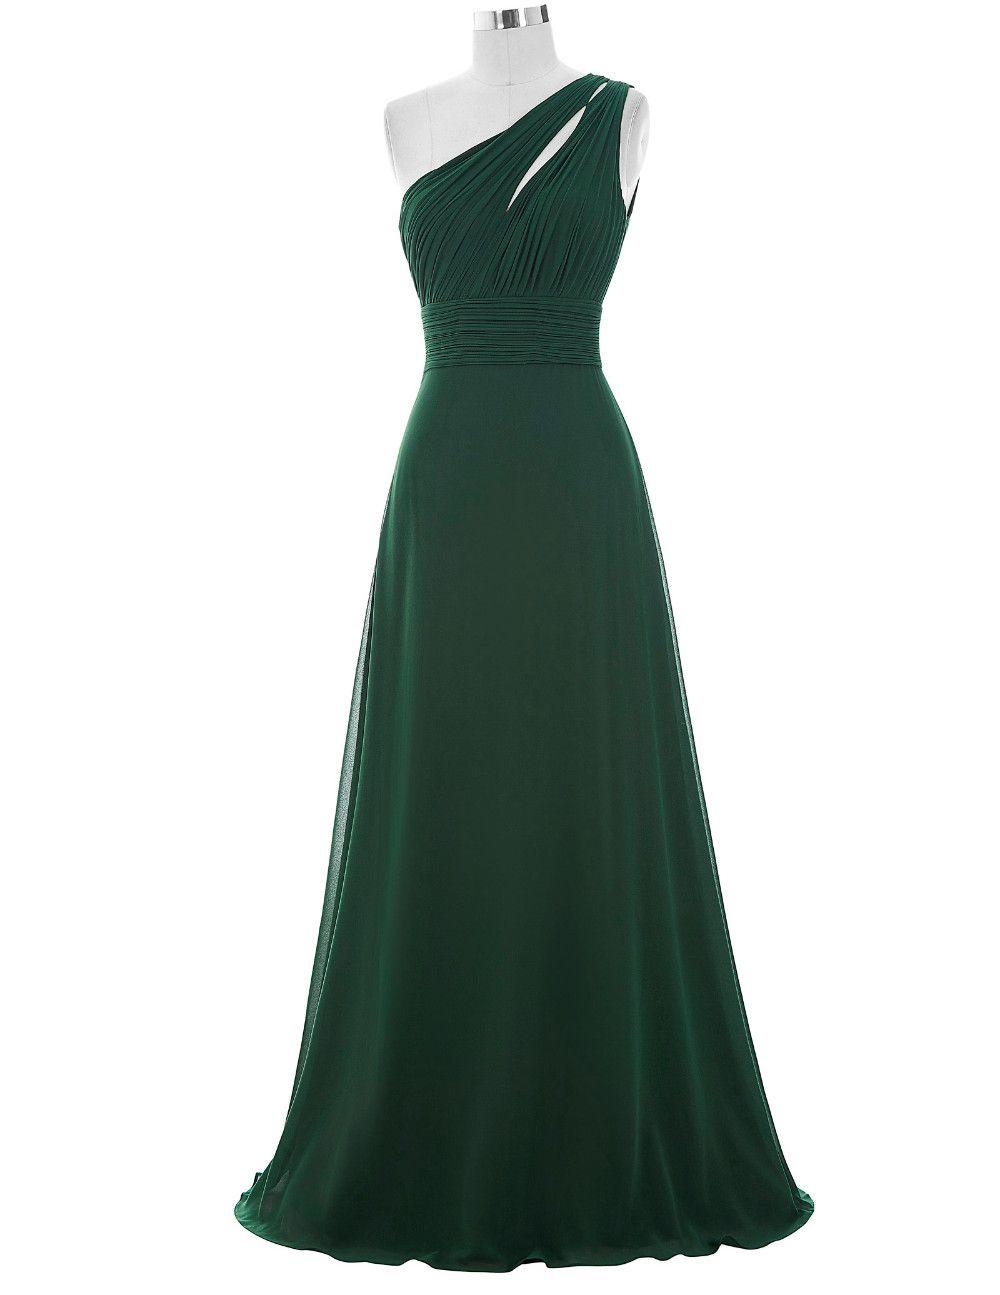 Forest green floor length chiffon aline evening dress prom or